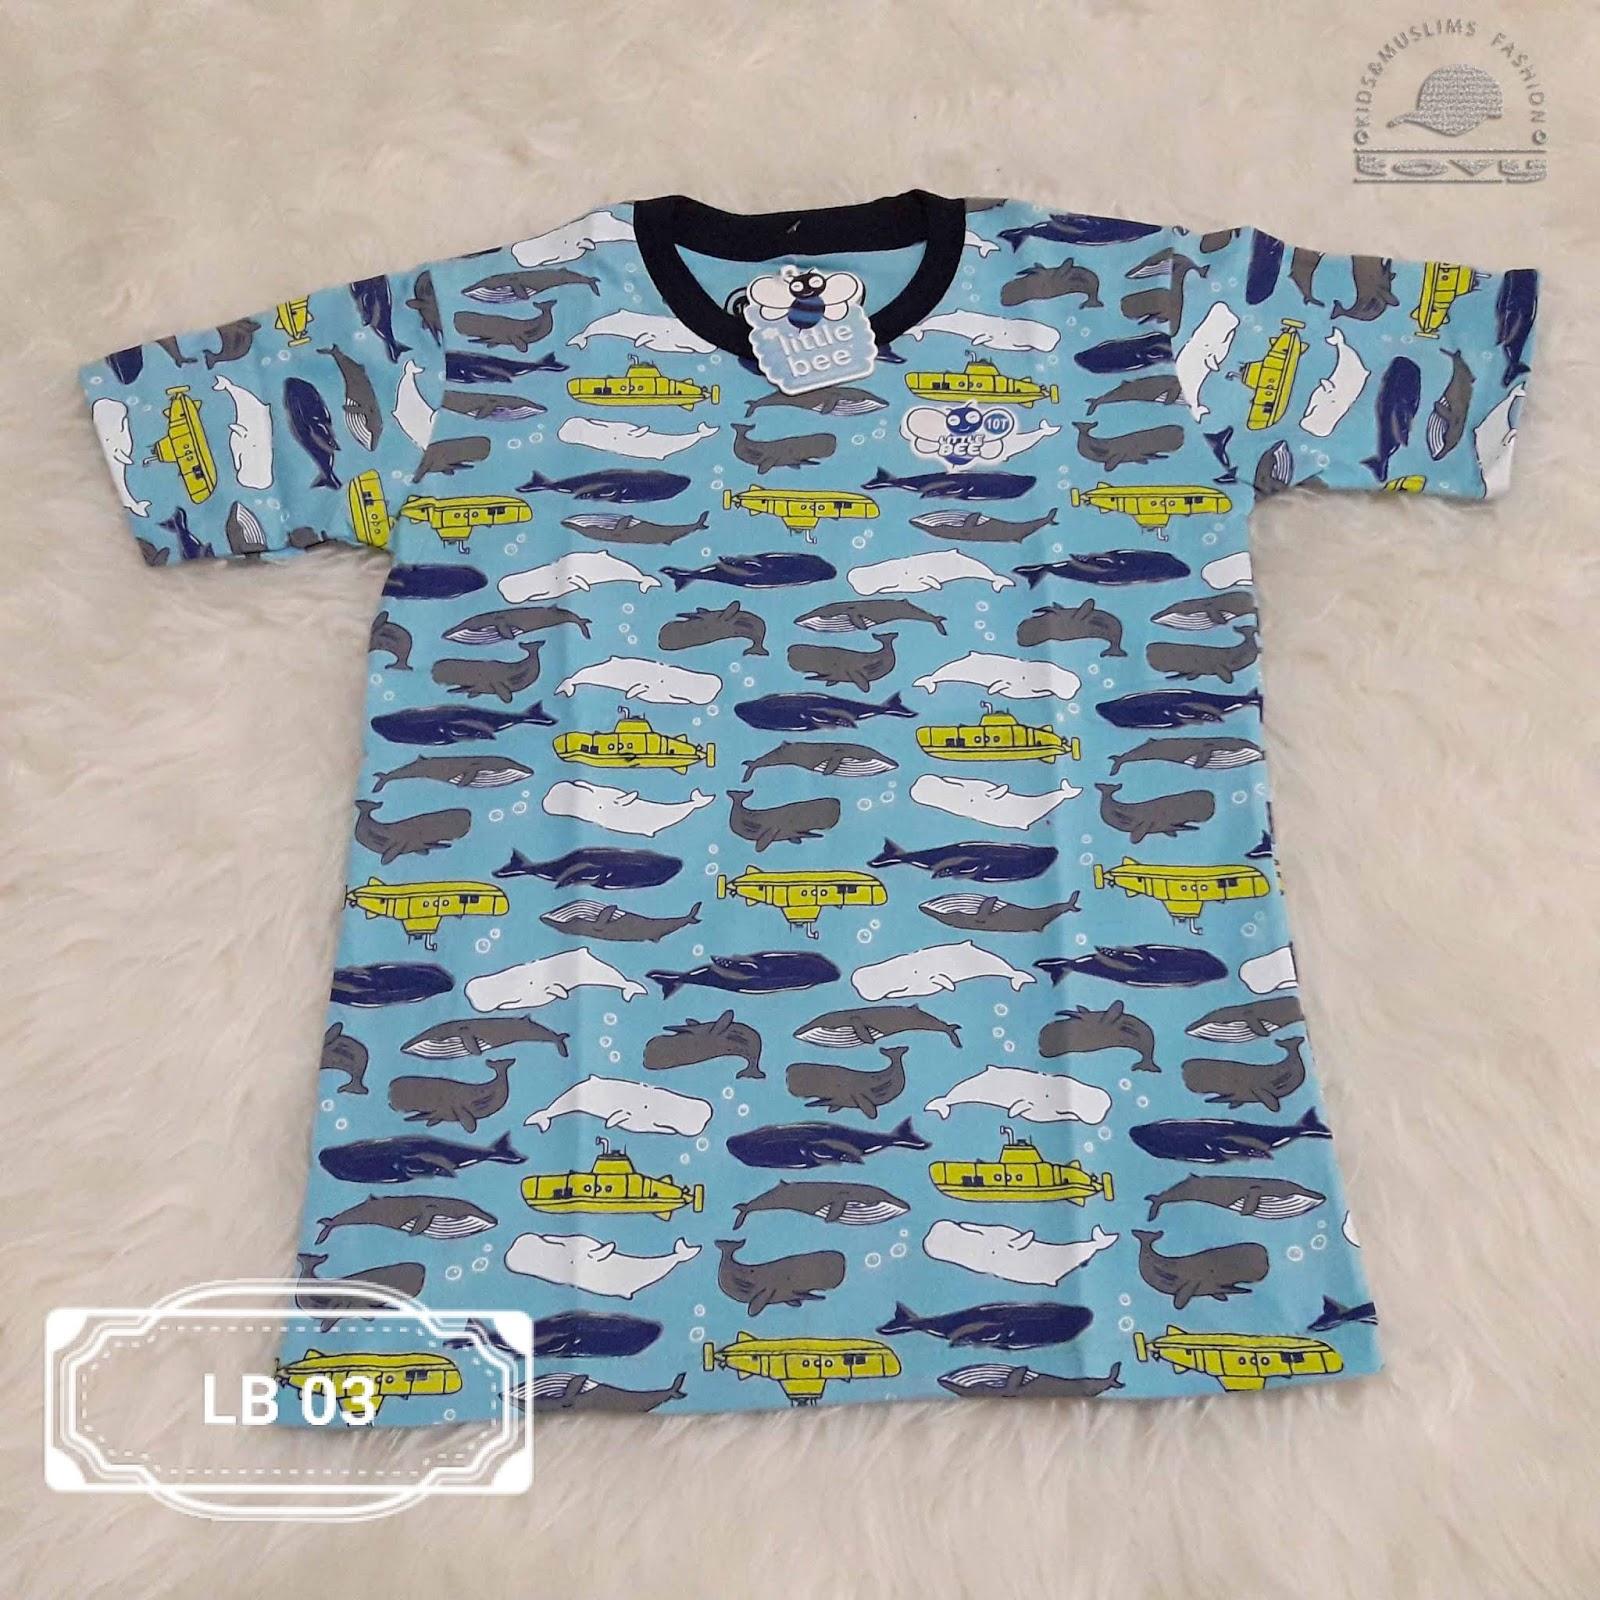 Reseller very ry ry wel e Happy Shopping Wassalamualaikum ==================================== kaos littlebee baju bajuanak